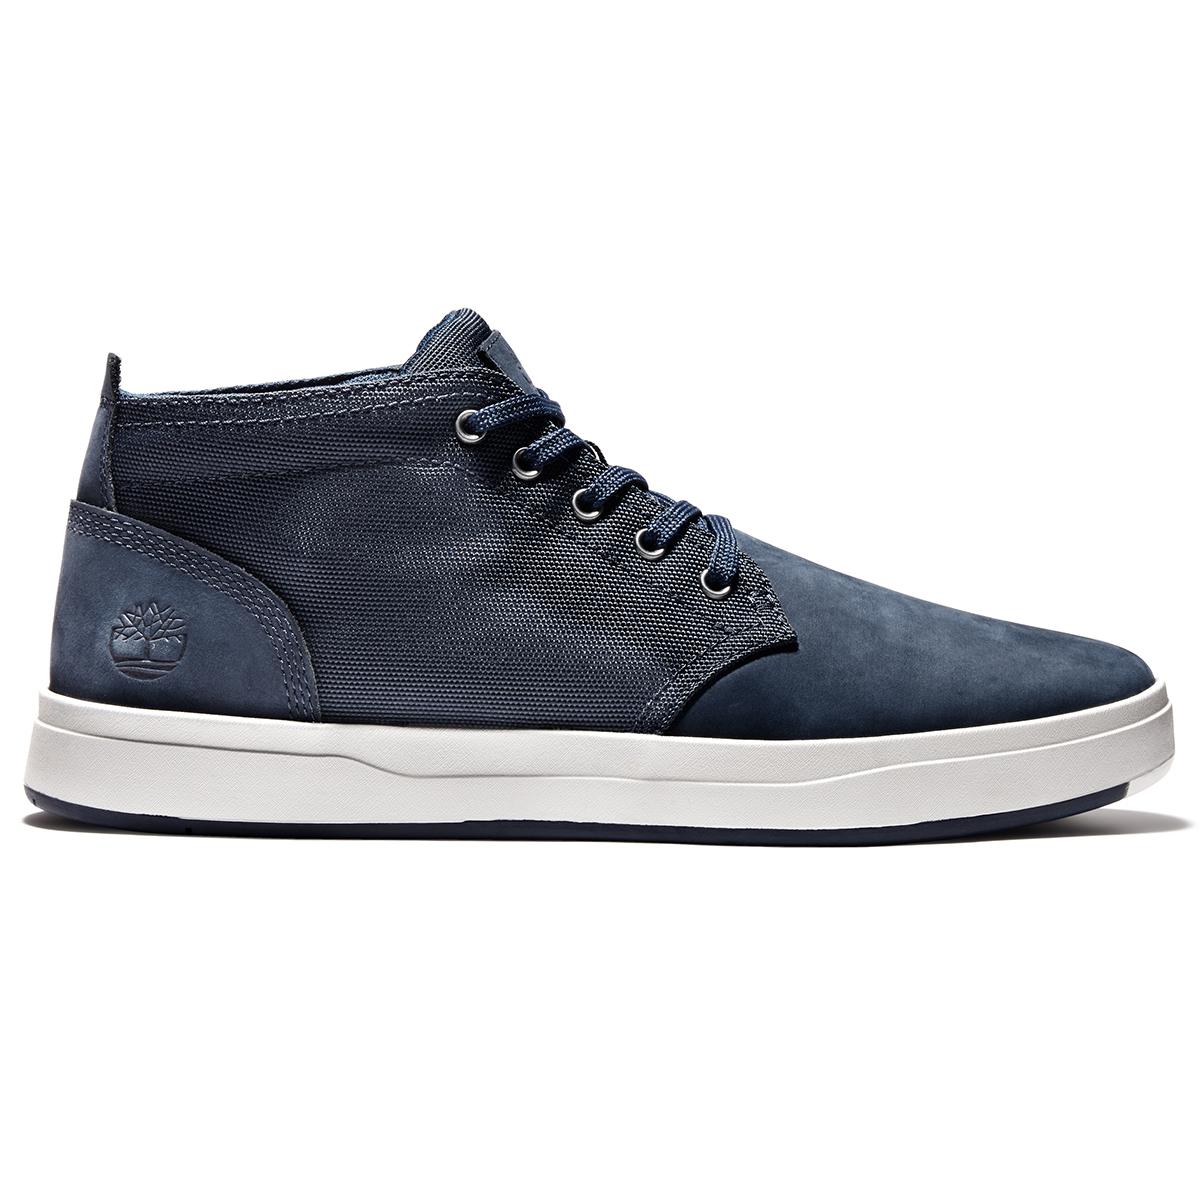 Timberland Men's Davis Square Chukka Sneakers - Blue, 8